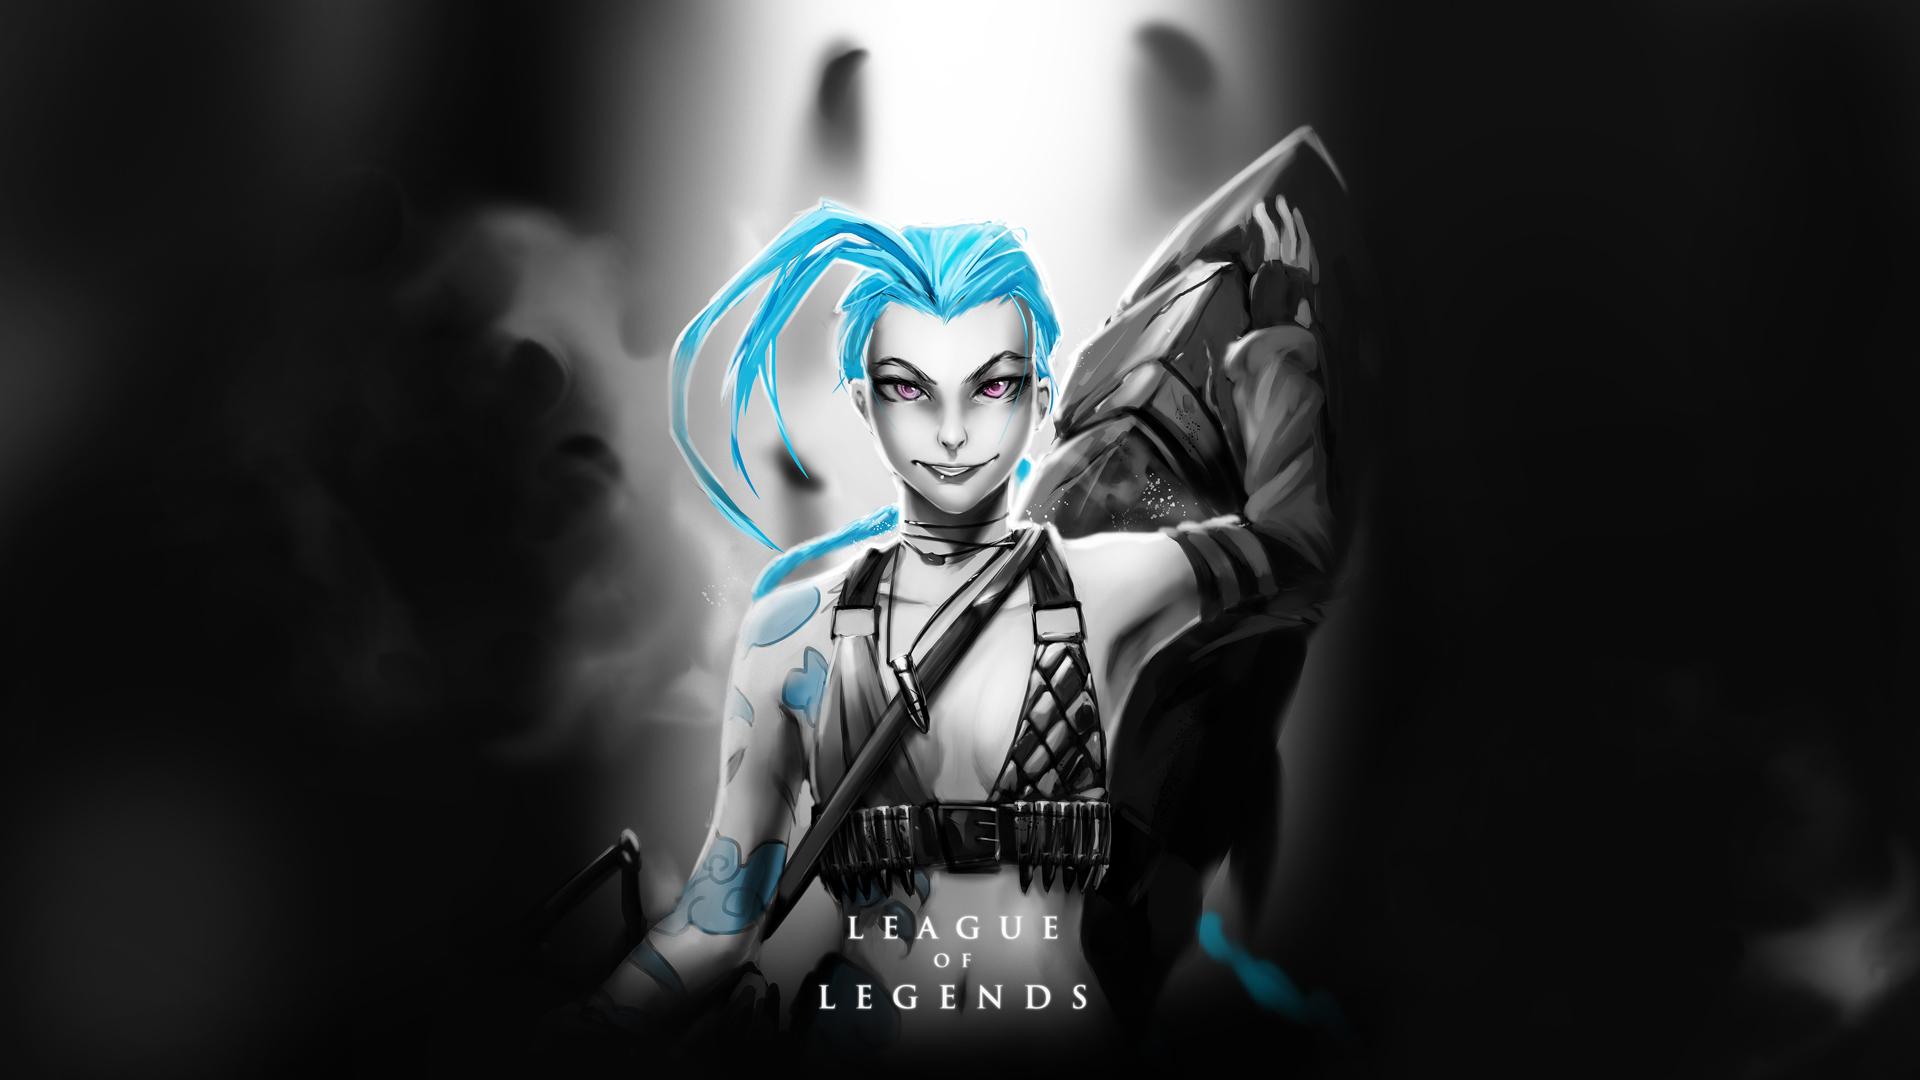 league of legends wallpaper iphone 4